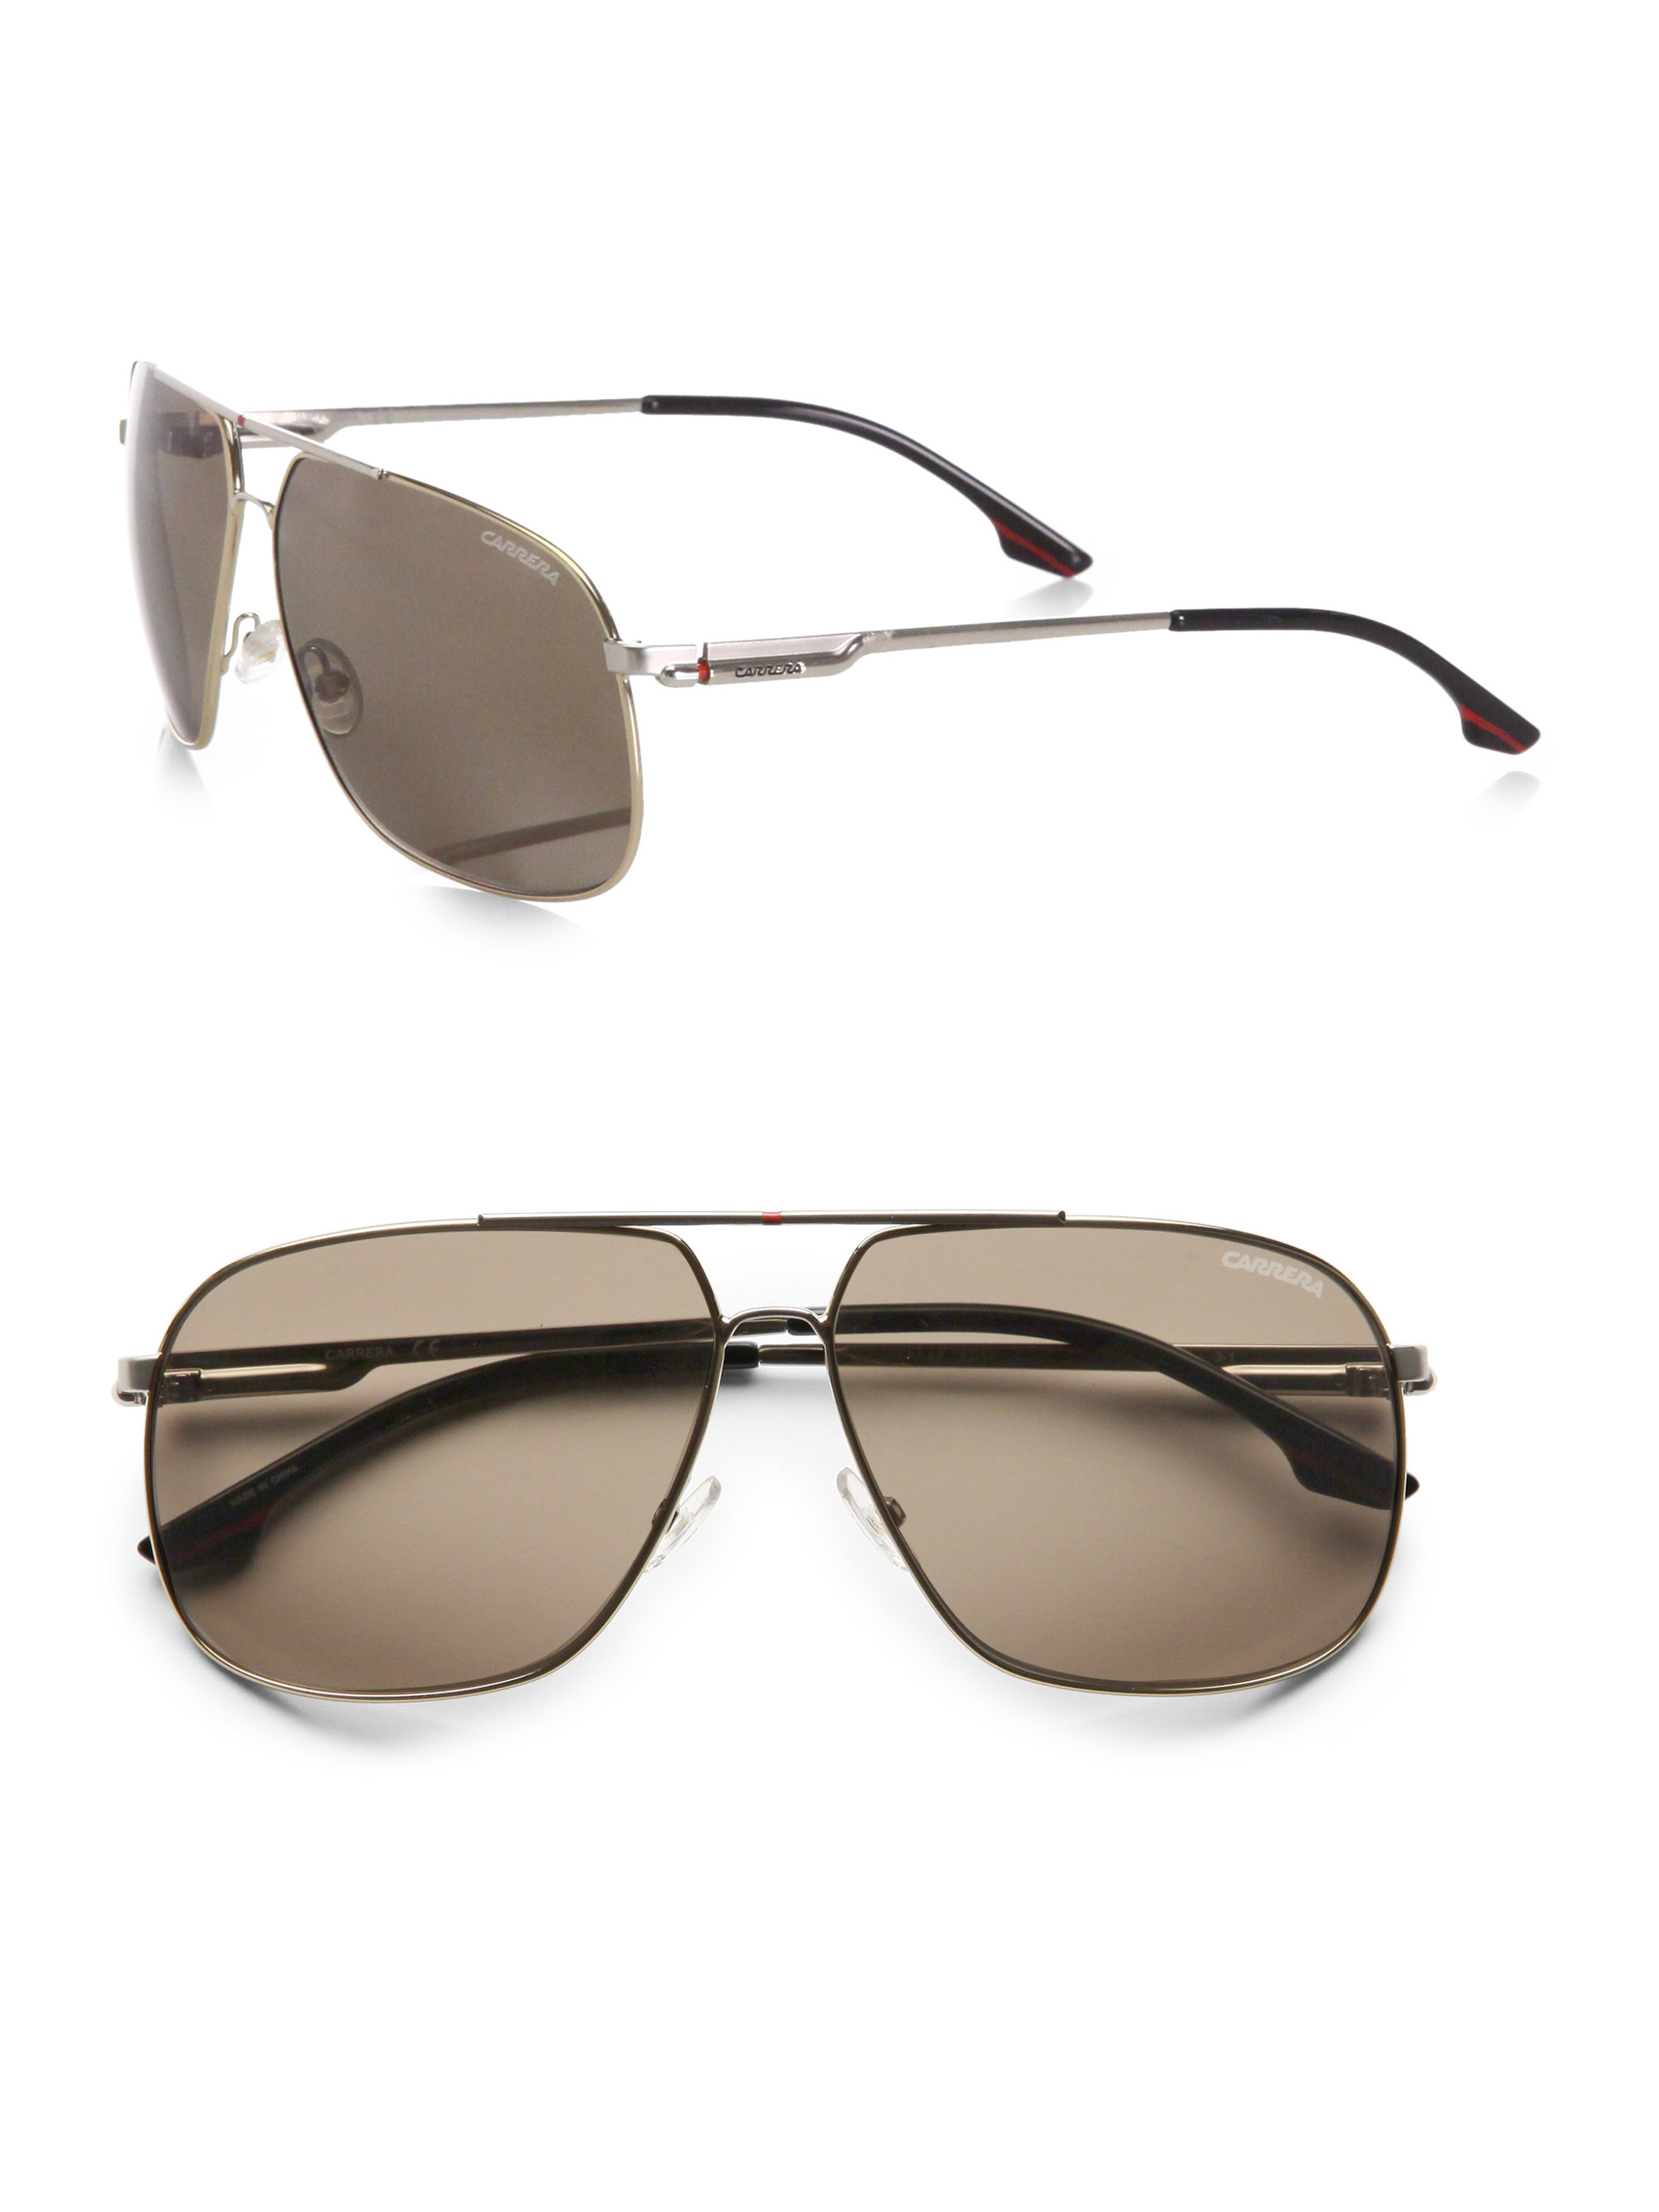 27f03905d6dbd Lyst - Carrera Doublebridge Navigator Sunglasses in Brown for Men